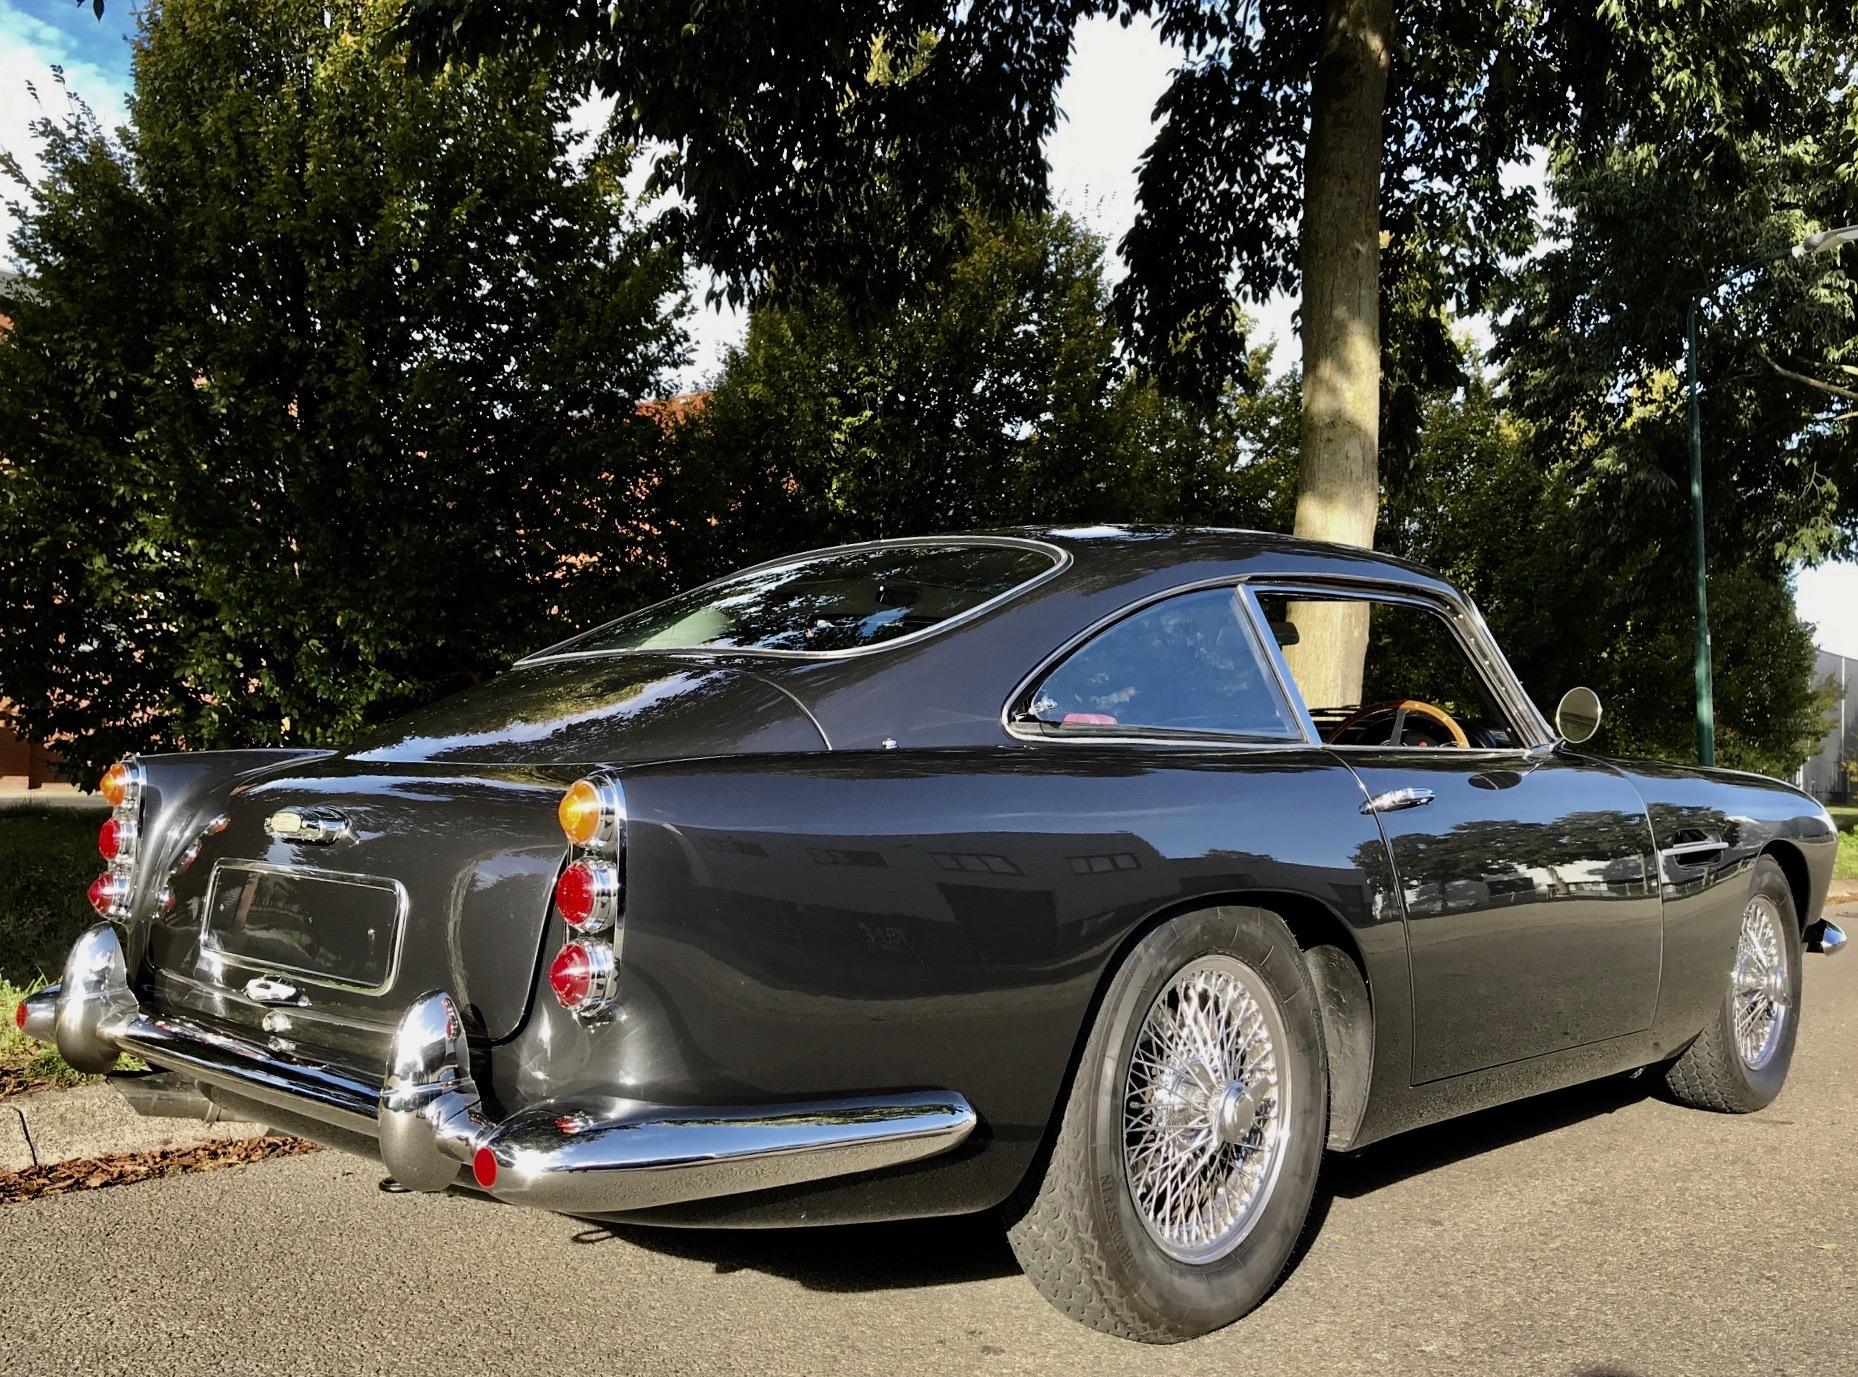 Aston Martin DB4 series series 3